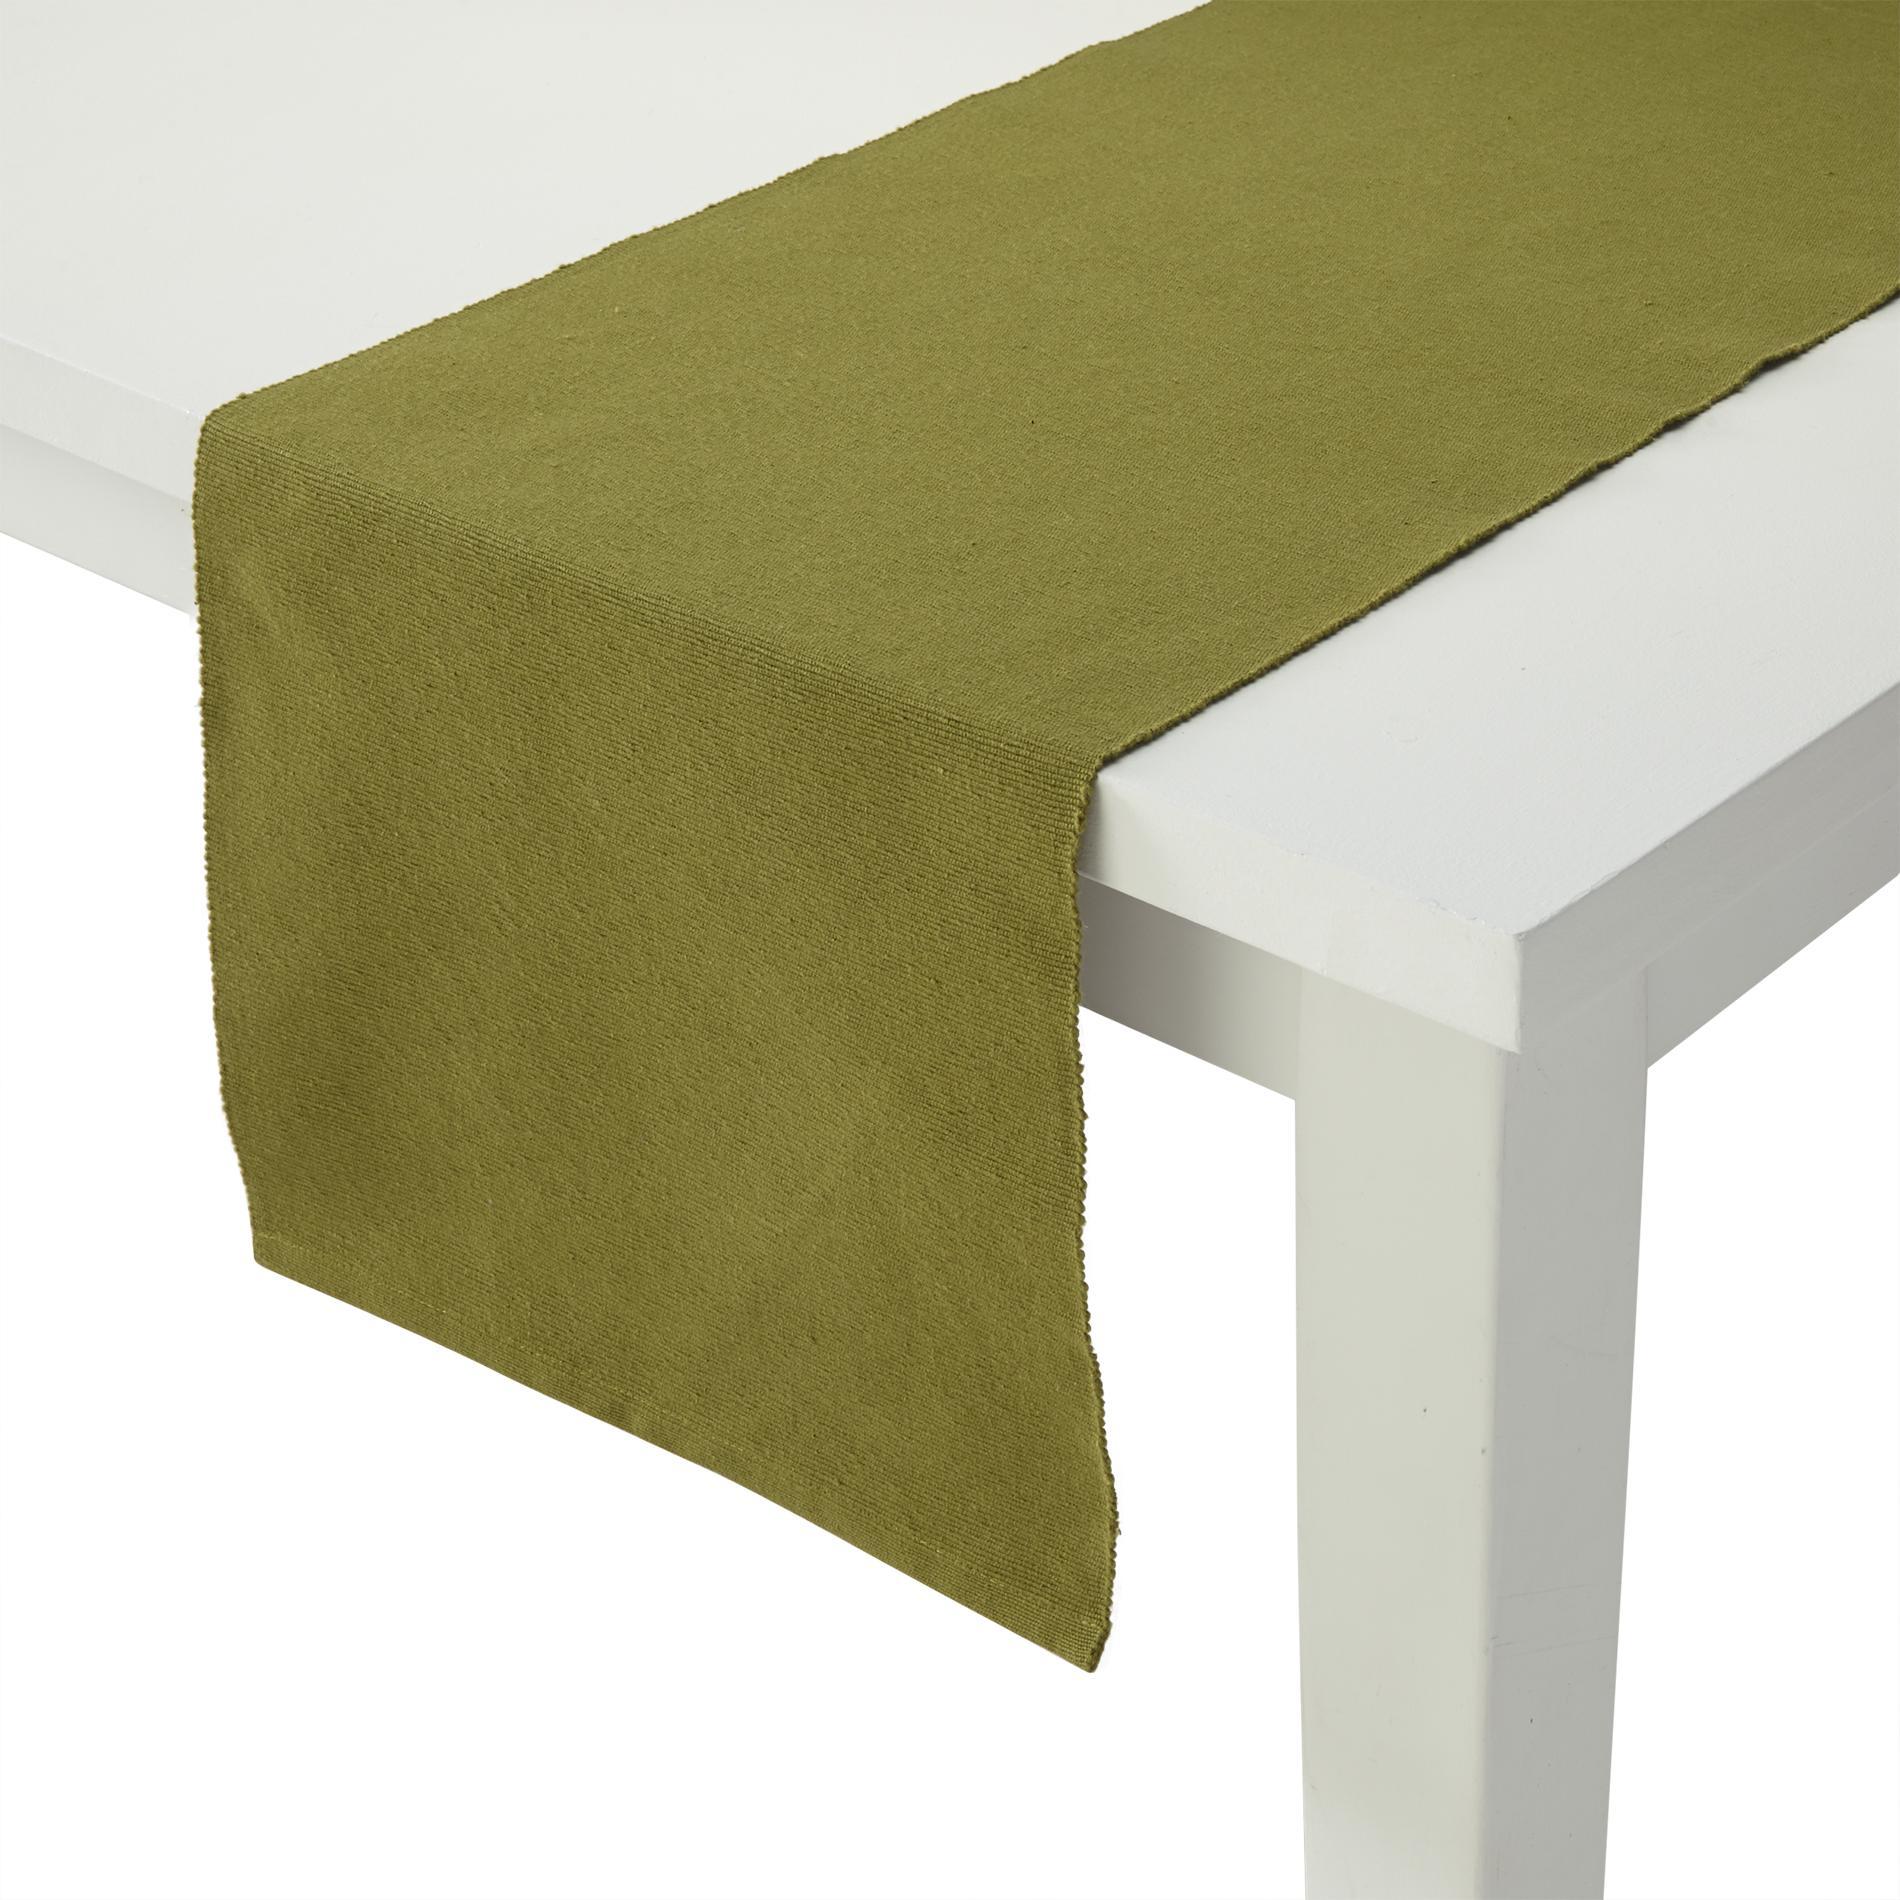 Homewear Solid Rib Table Runner - Bradford PartNumber: 048W001196939001P KsnValue: 048W001196939001 MfgPartNumber: 80777-434